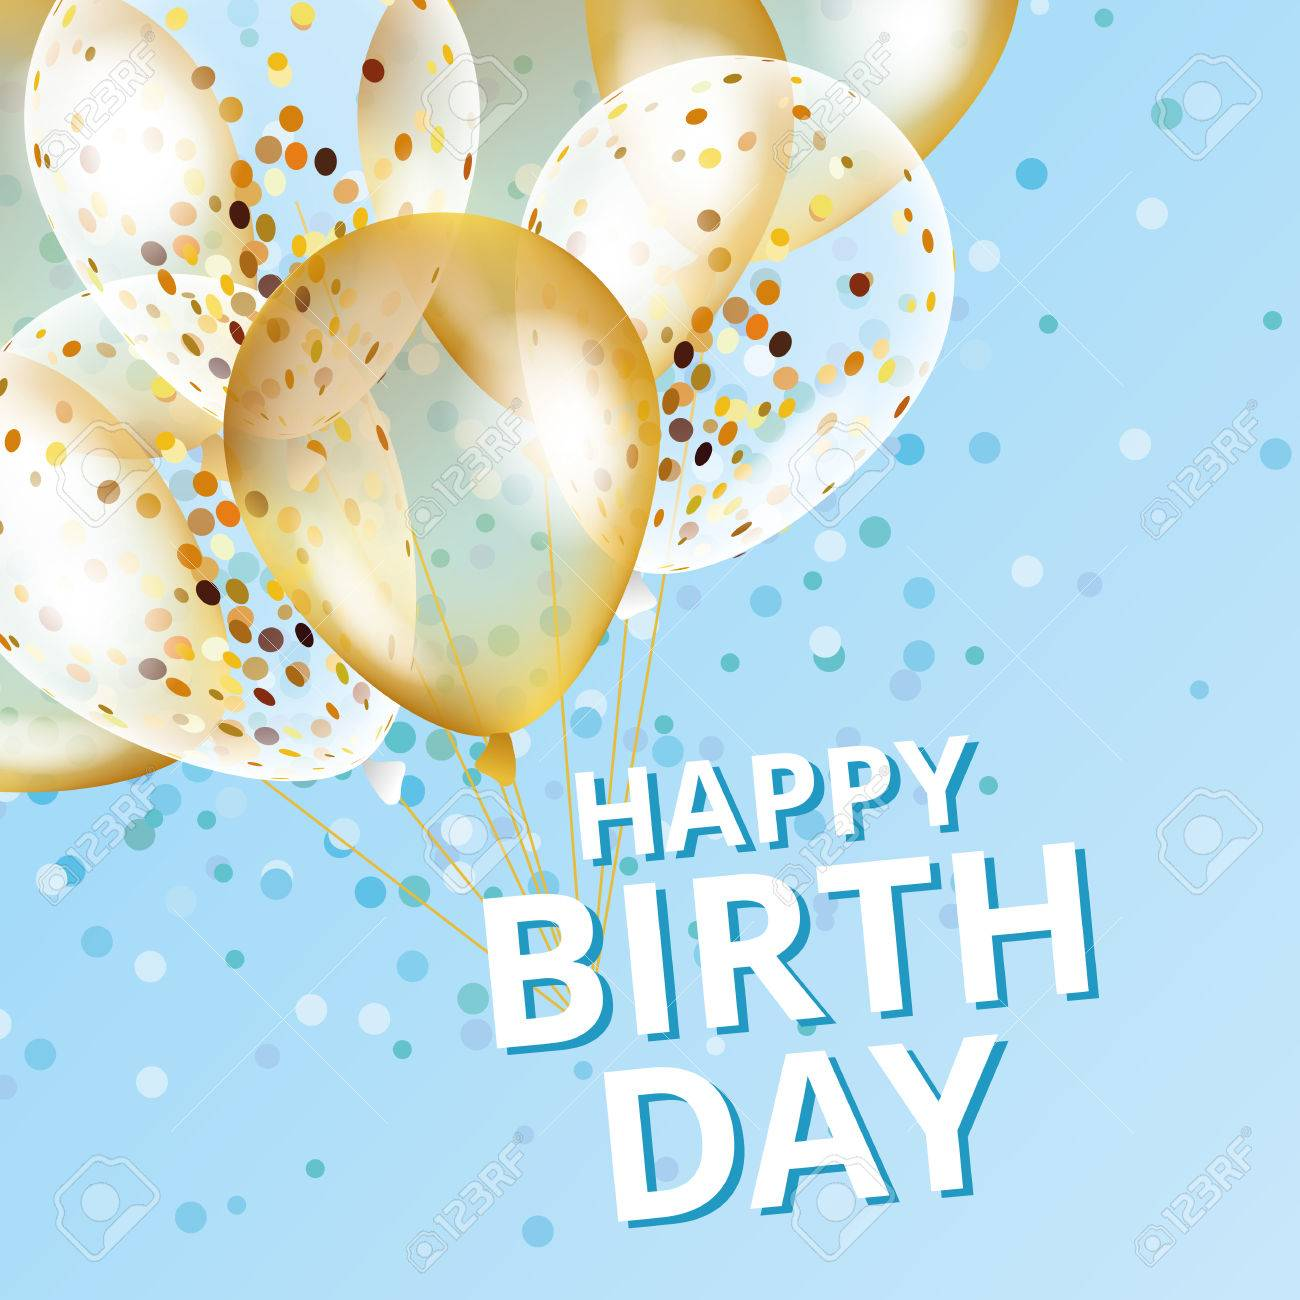 Balloons happy birthday - 79160218